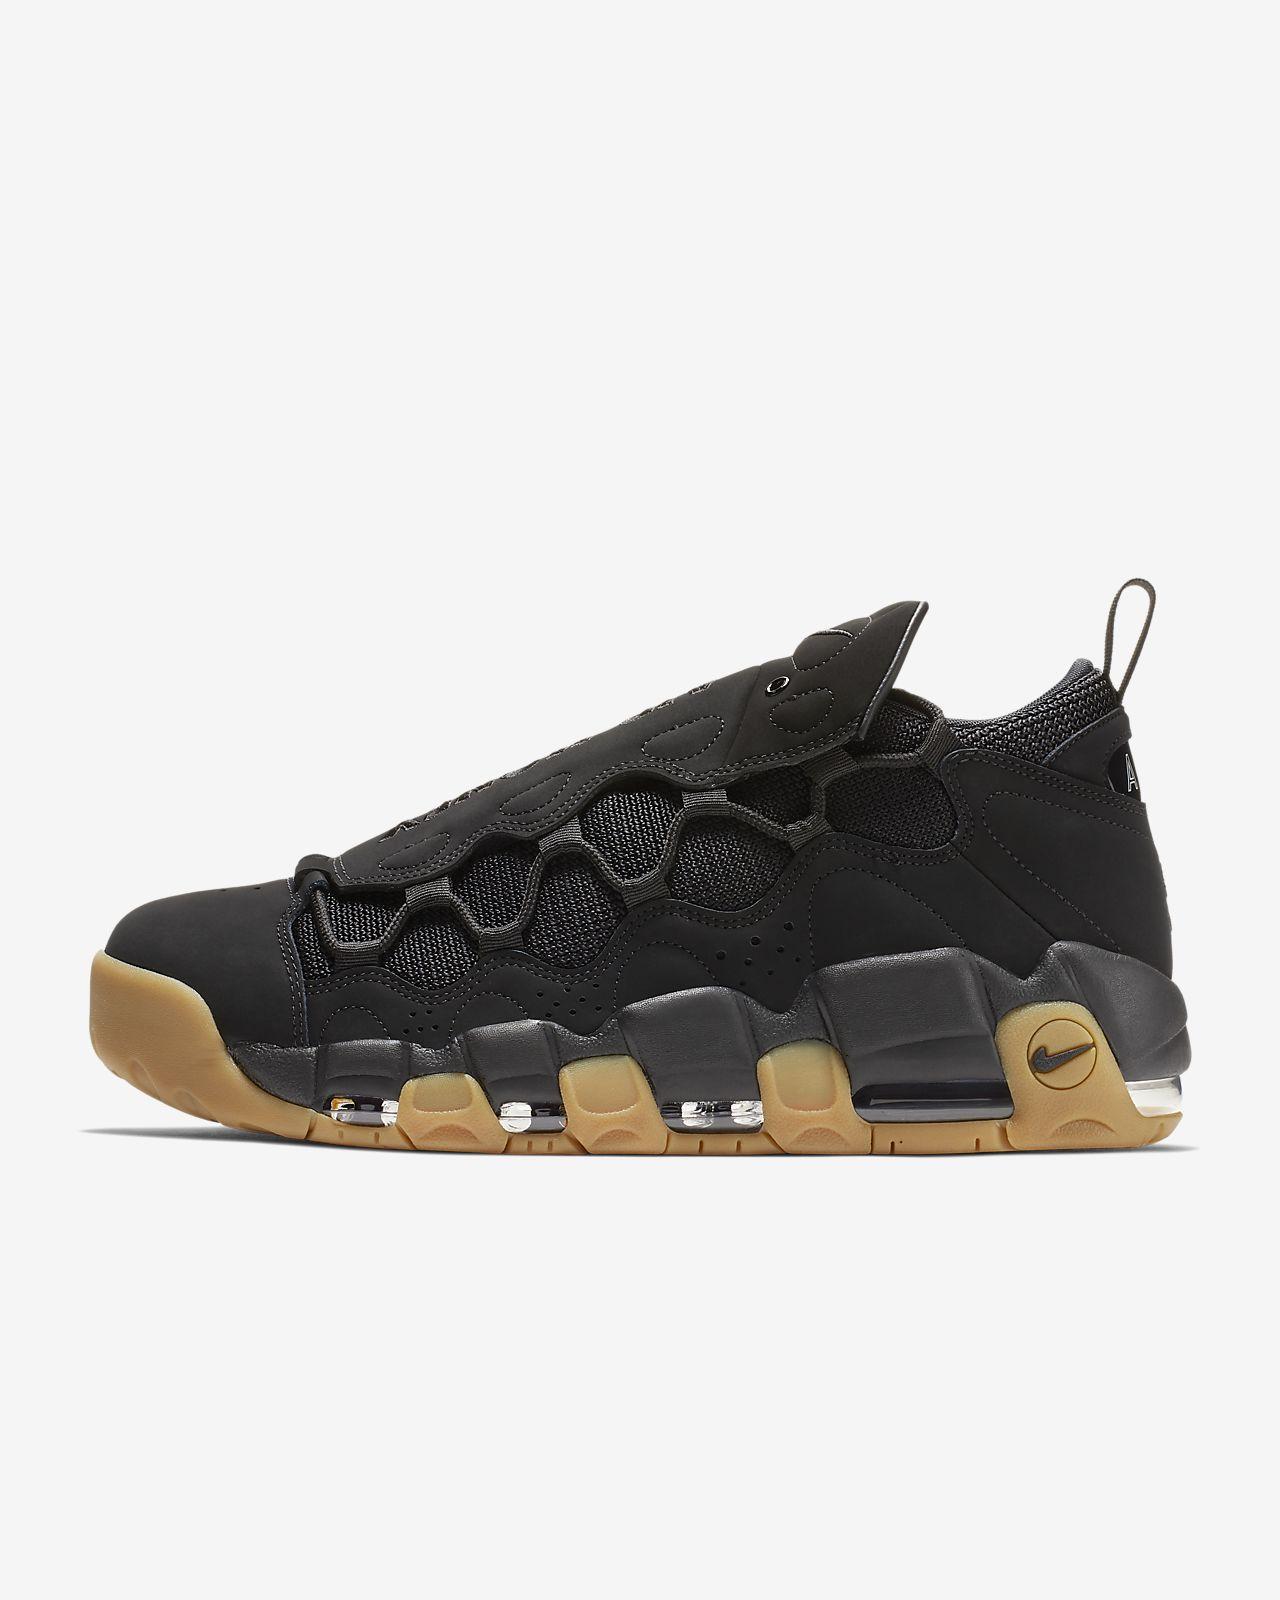 competitive price 002d7 b3e14 ... Nike Air More Money-sko til mænd